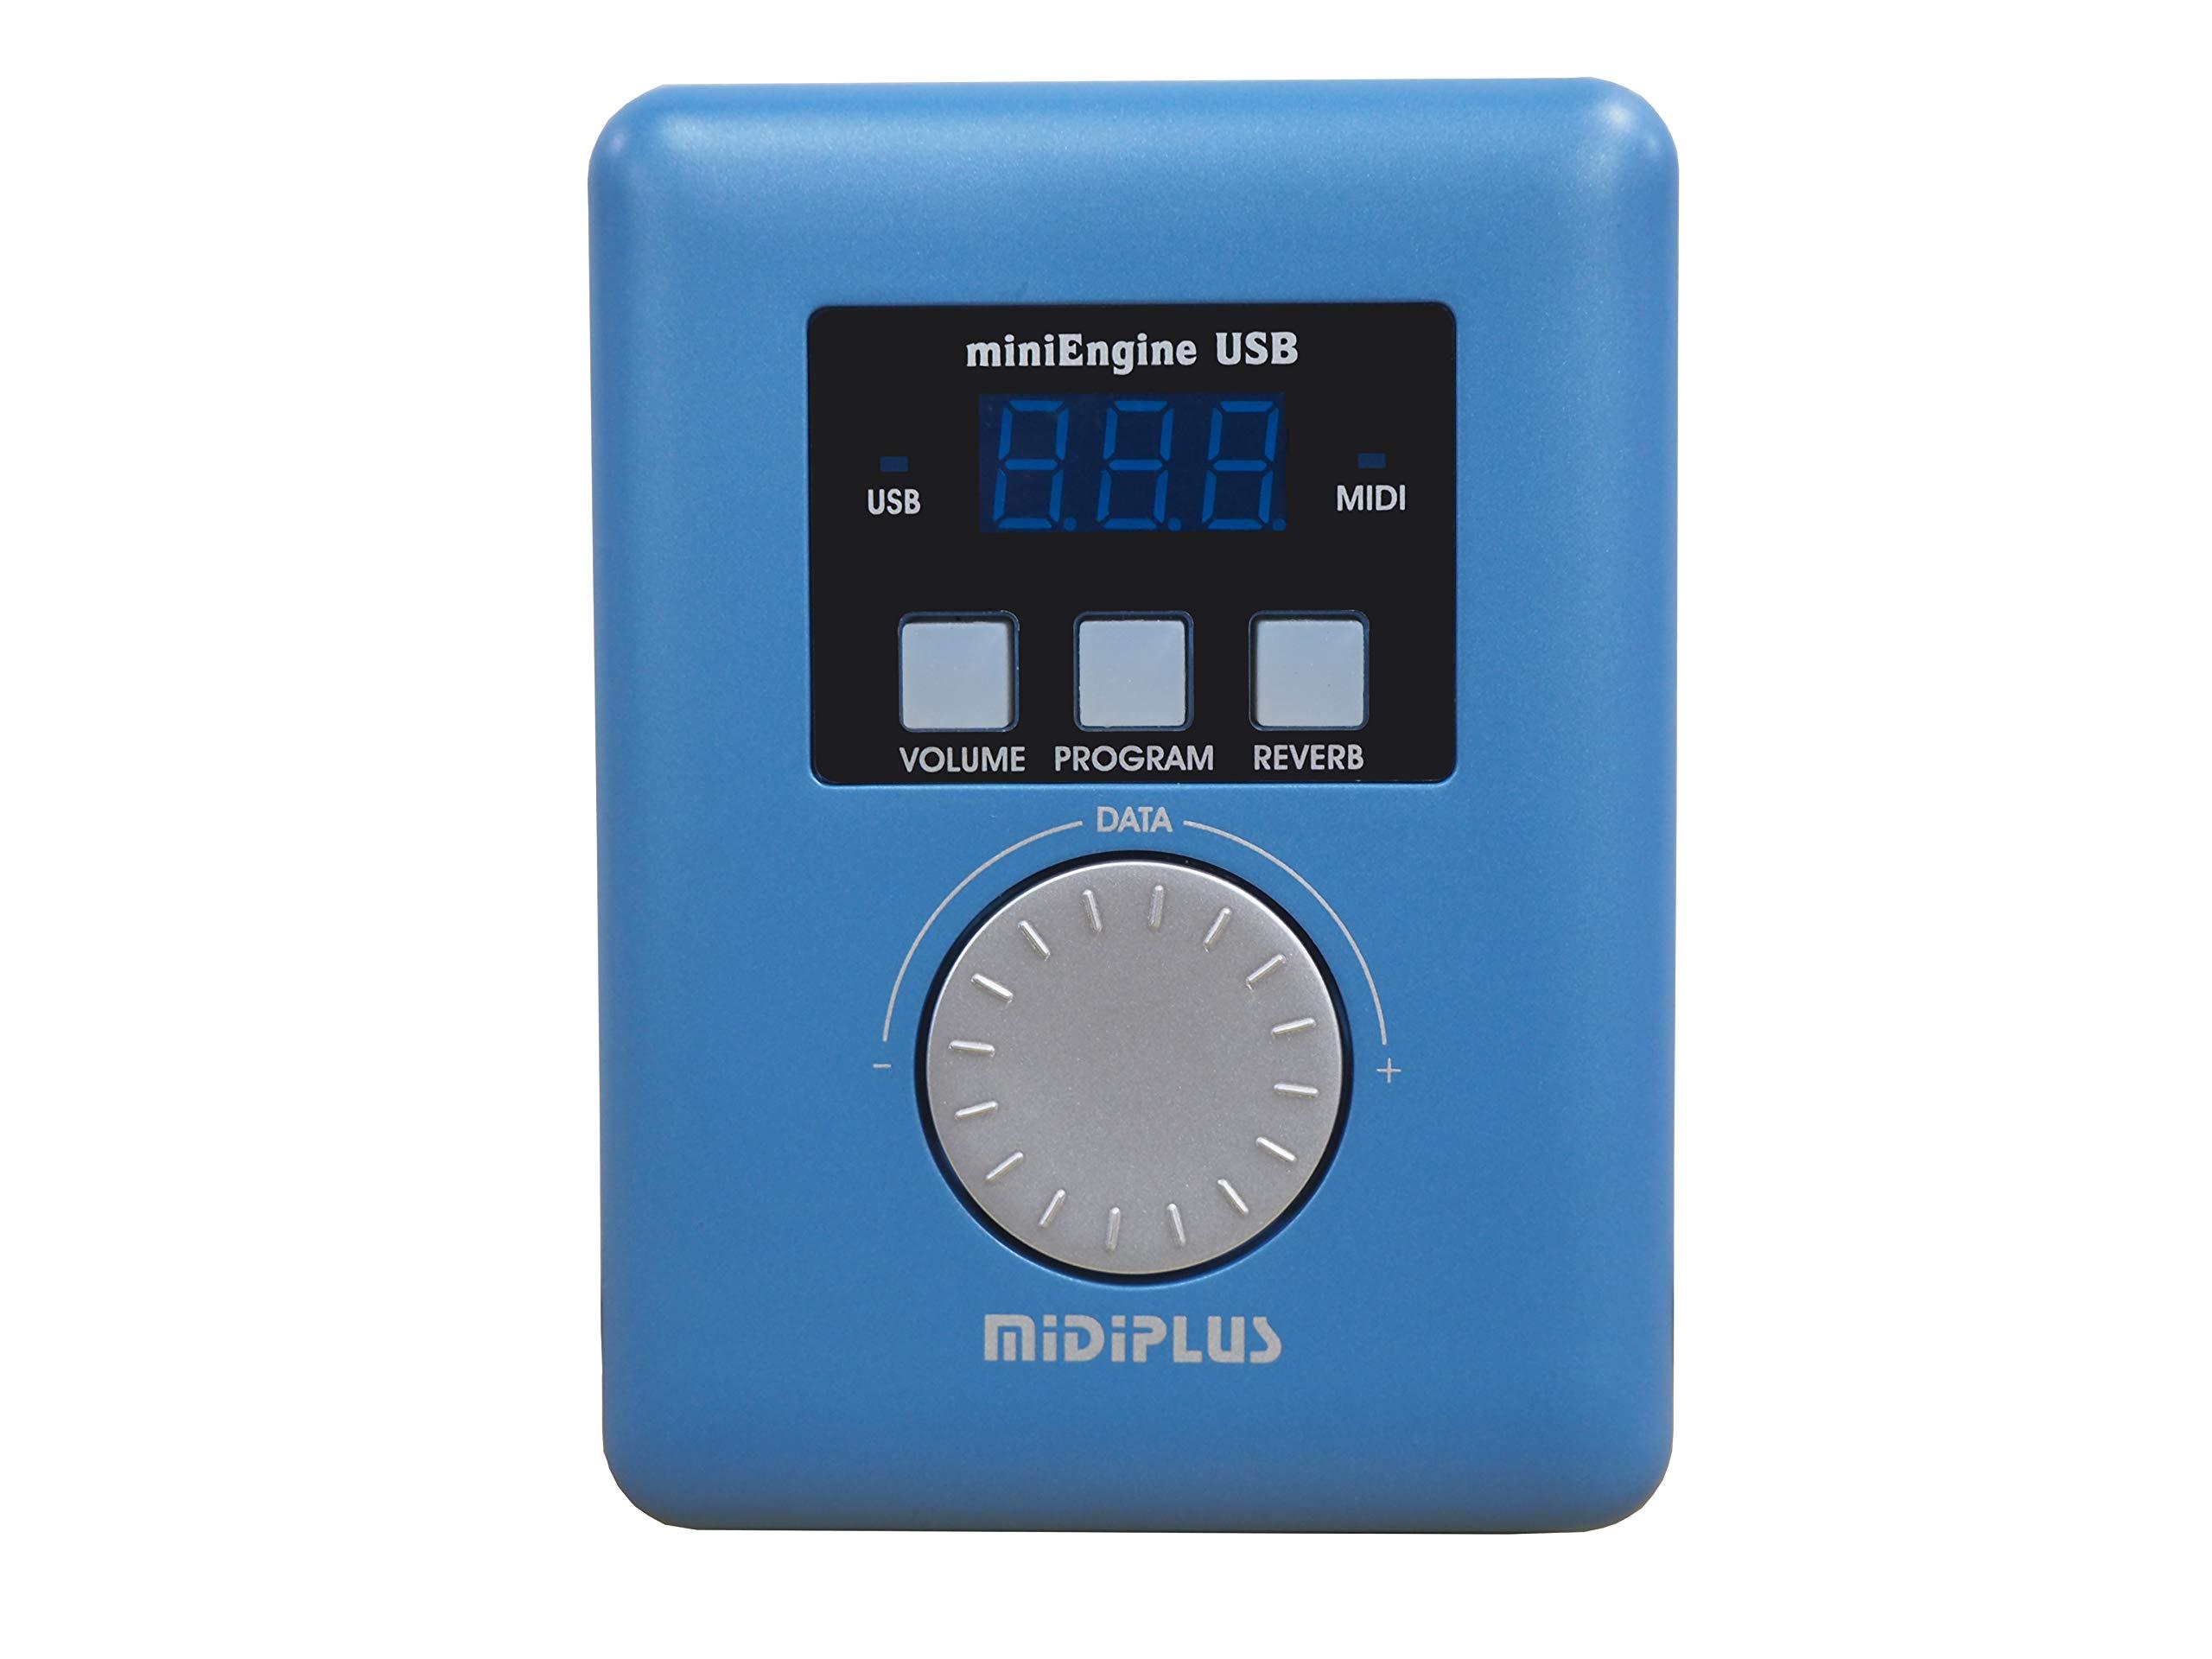 midiplus miniEngine USB MIDI Sound Module by Midiplus